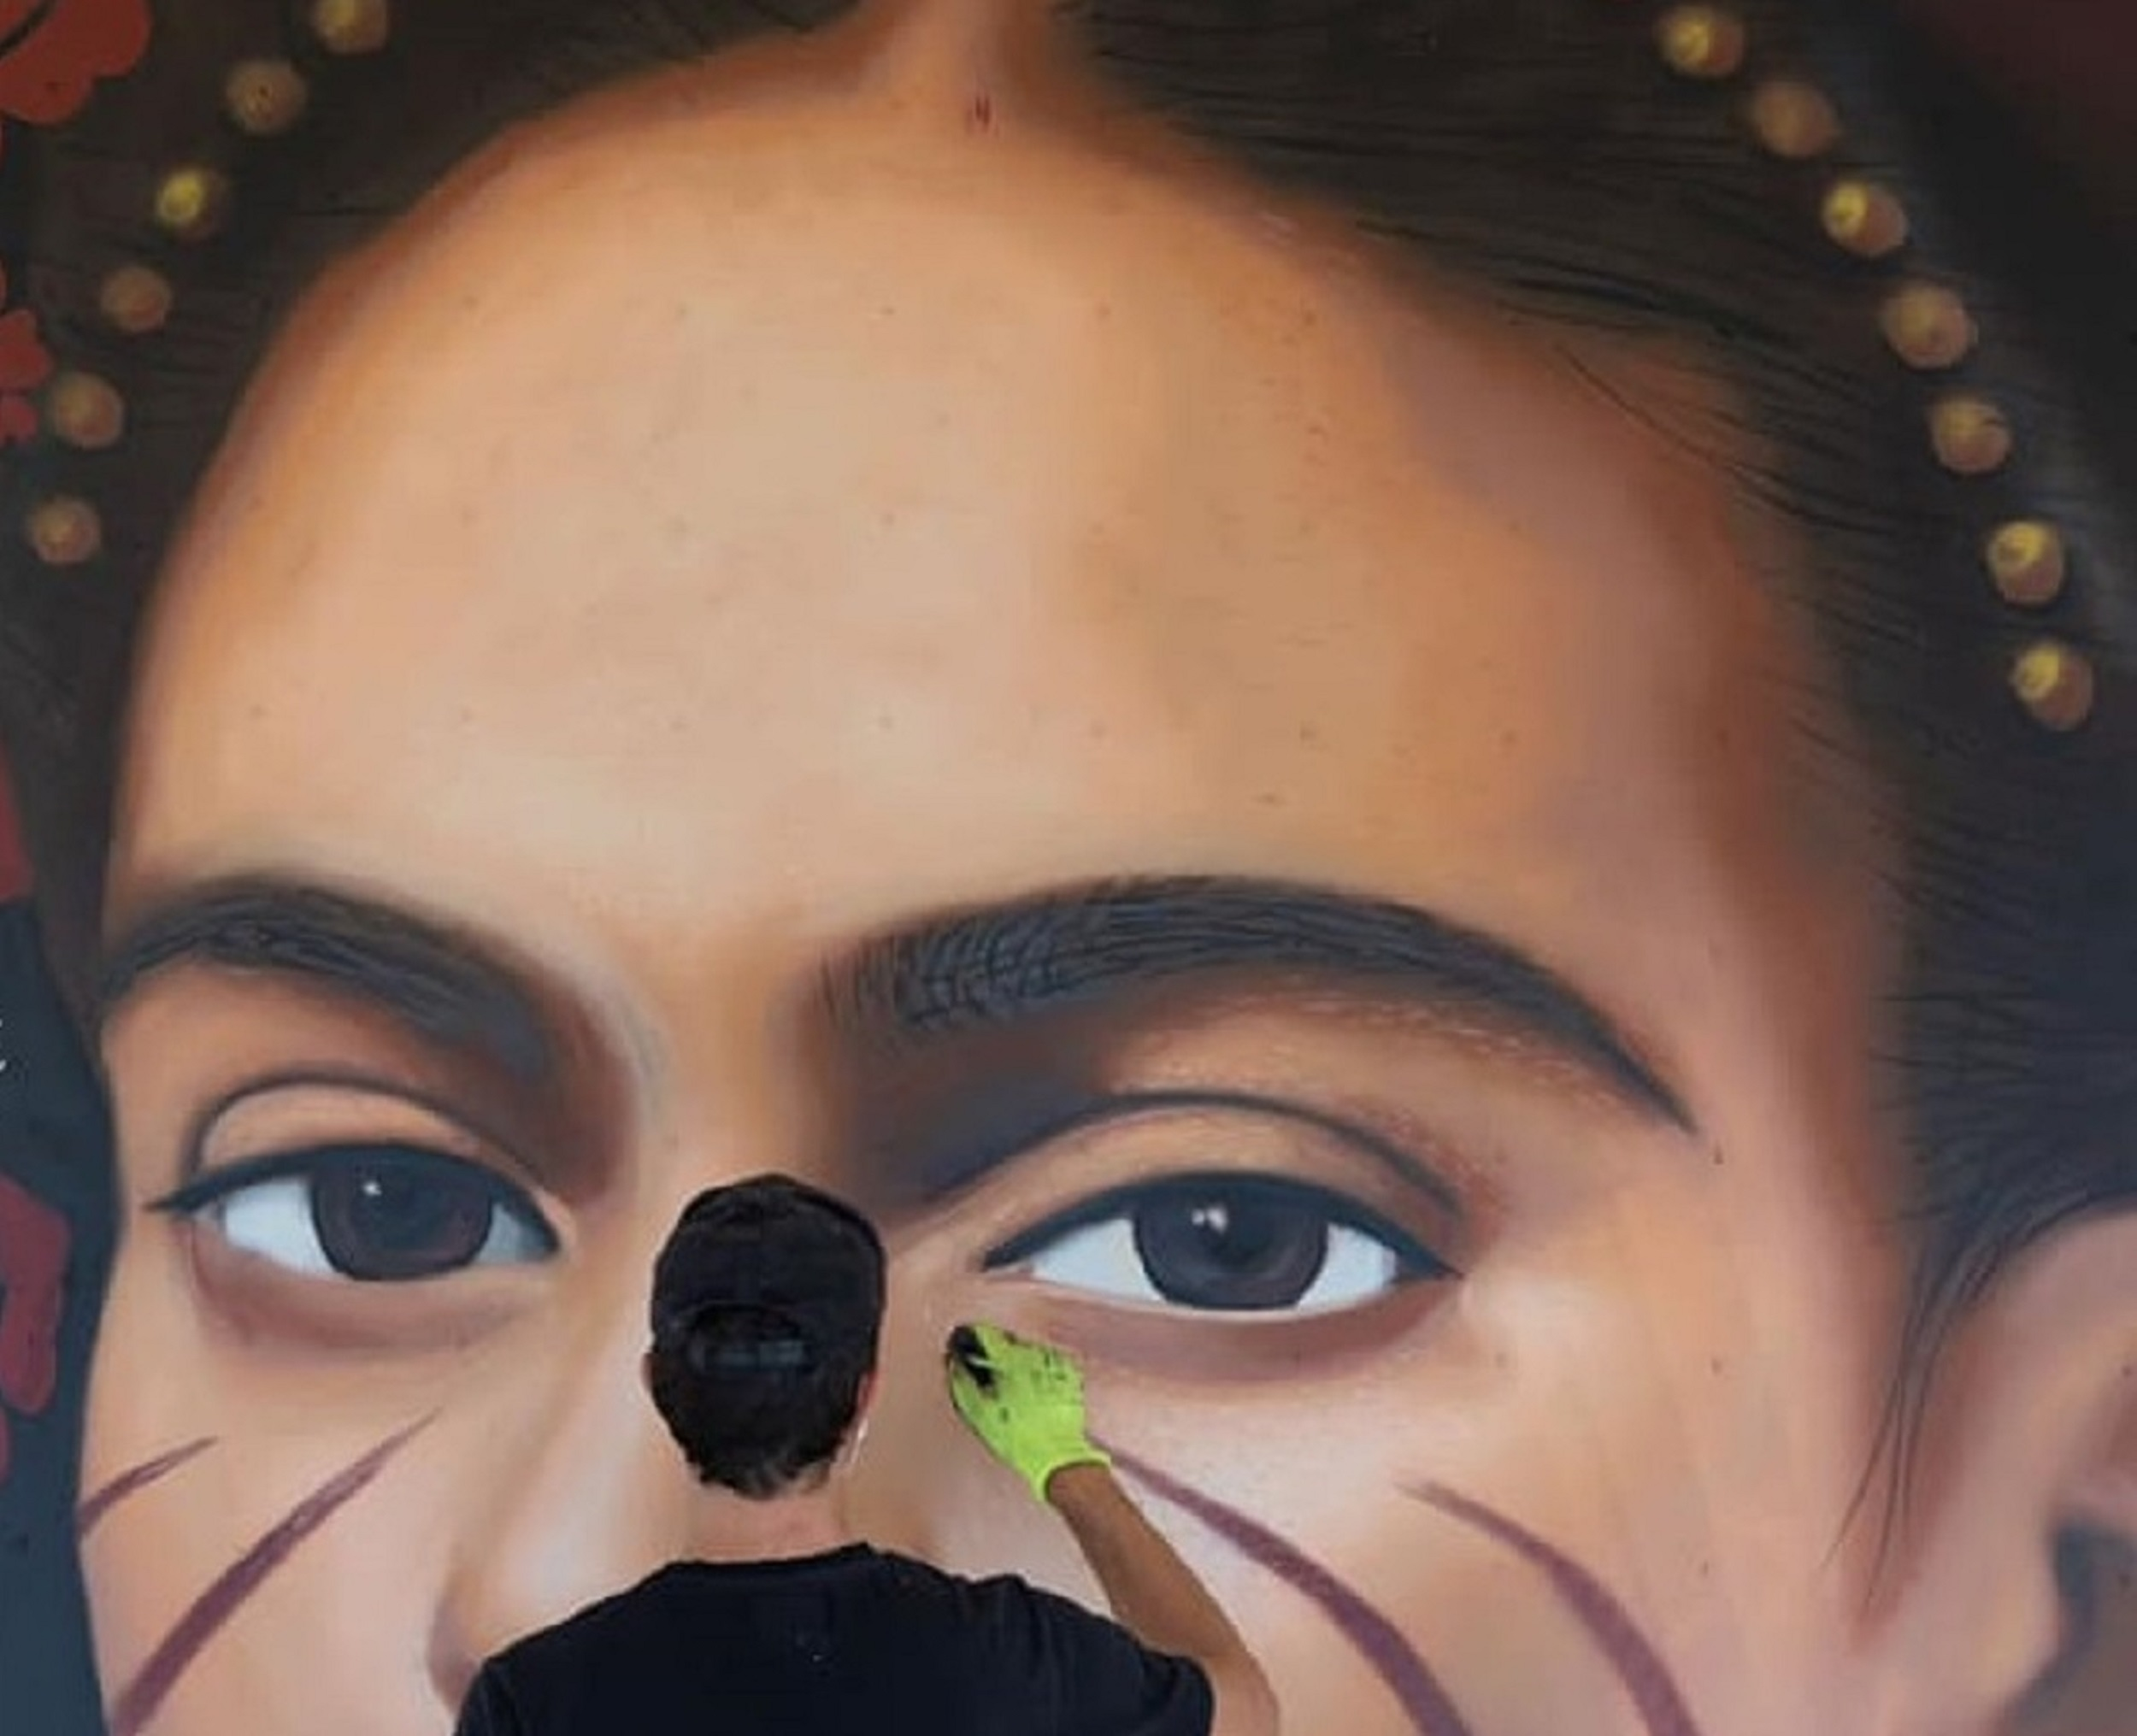 Le cicatrici di Frida Kahlo. L'ultima opera di Jorit per supportare Medici Senza Frontiere